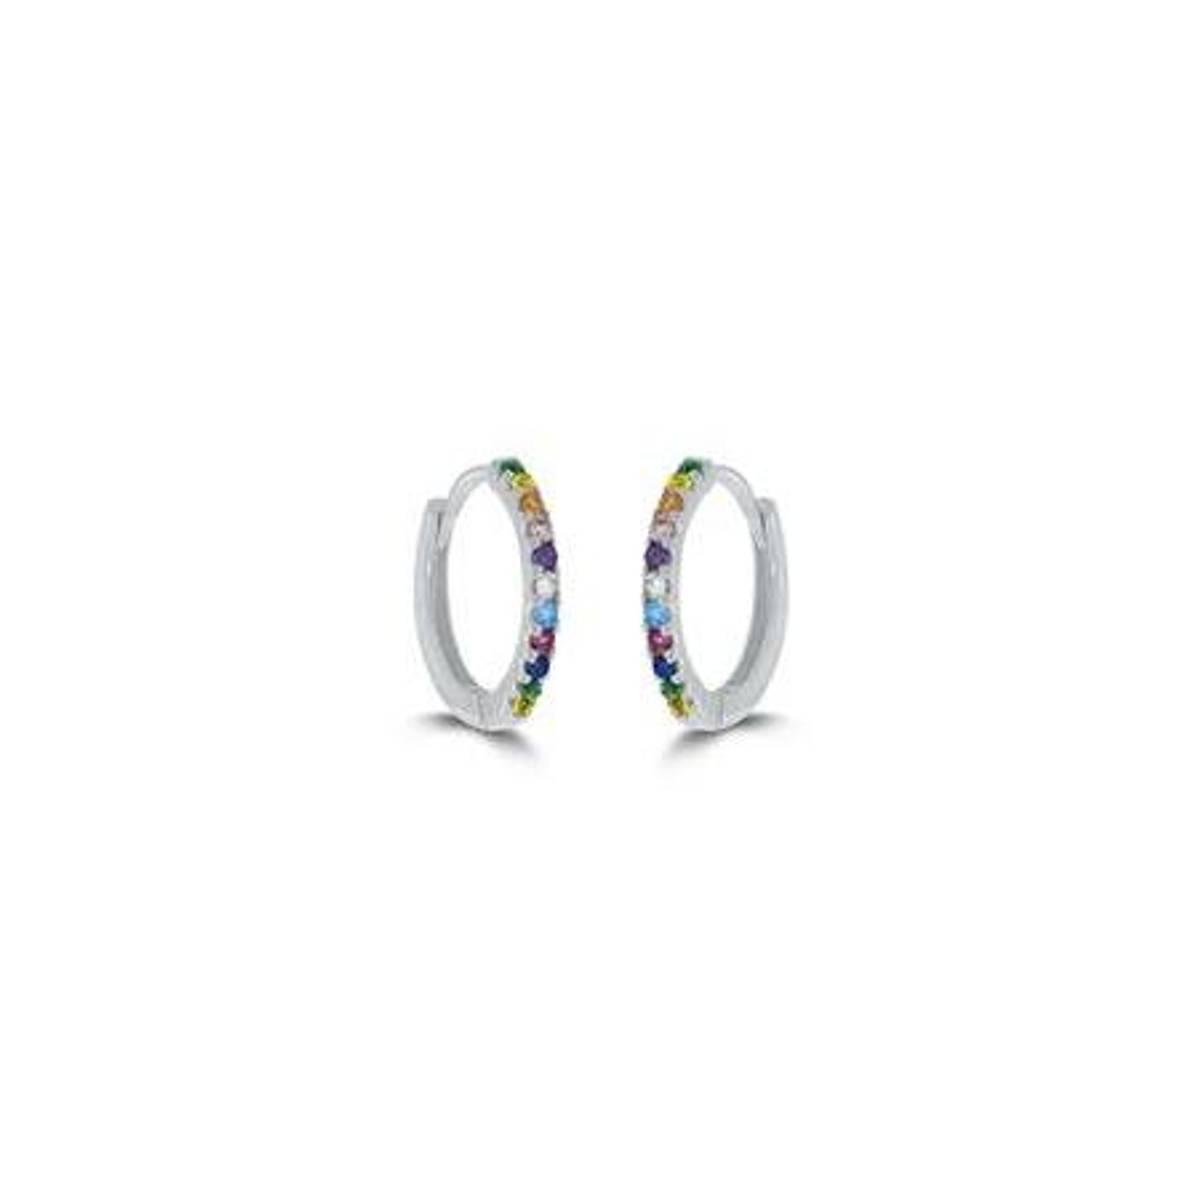 GD Classic øreringer i sølv med zirkonia